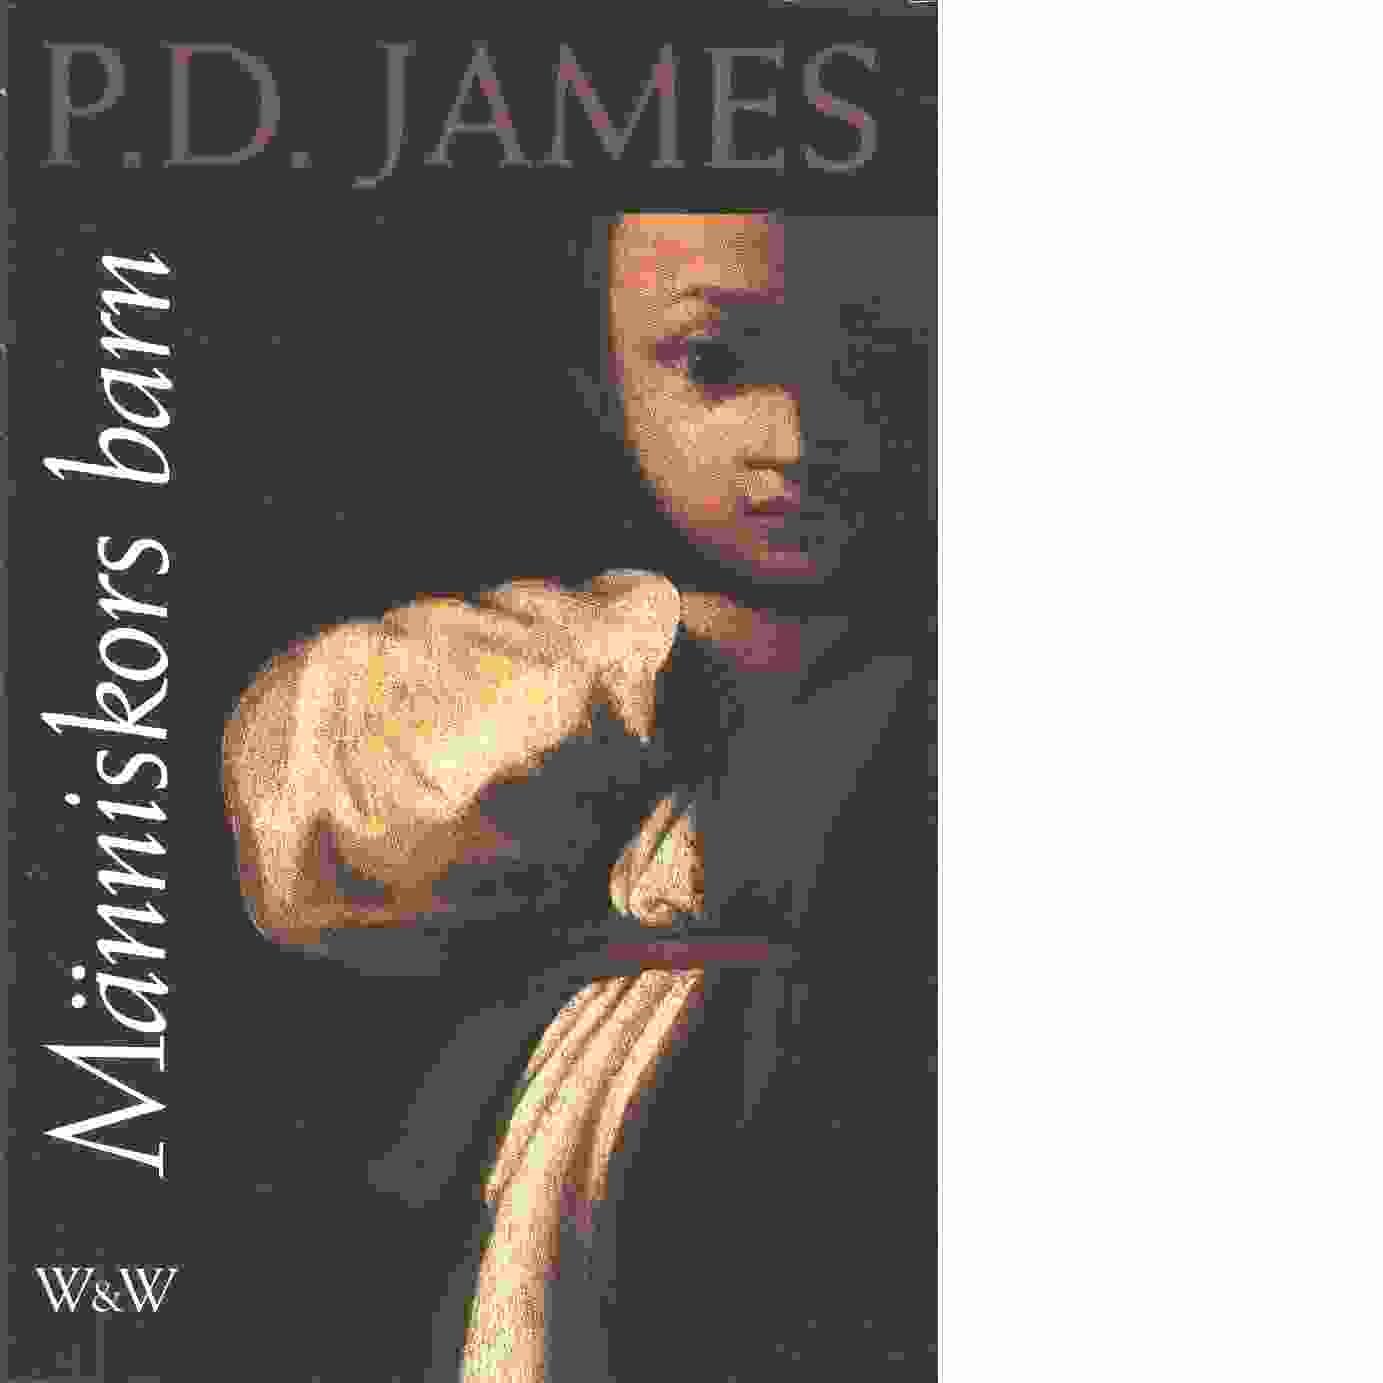 Människors barn - James, P. D.